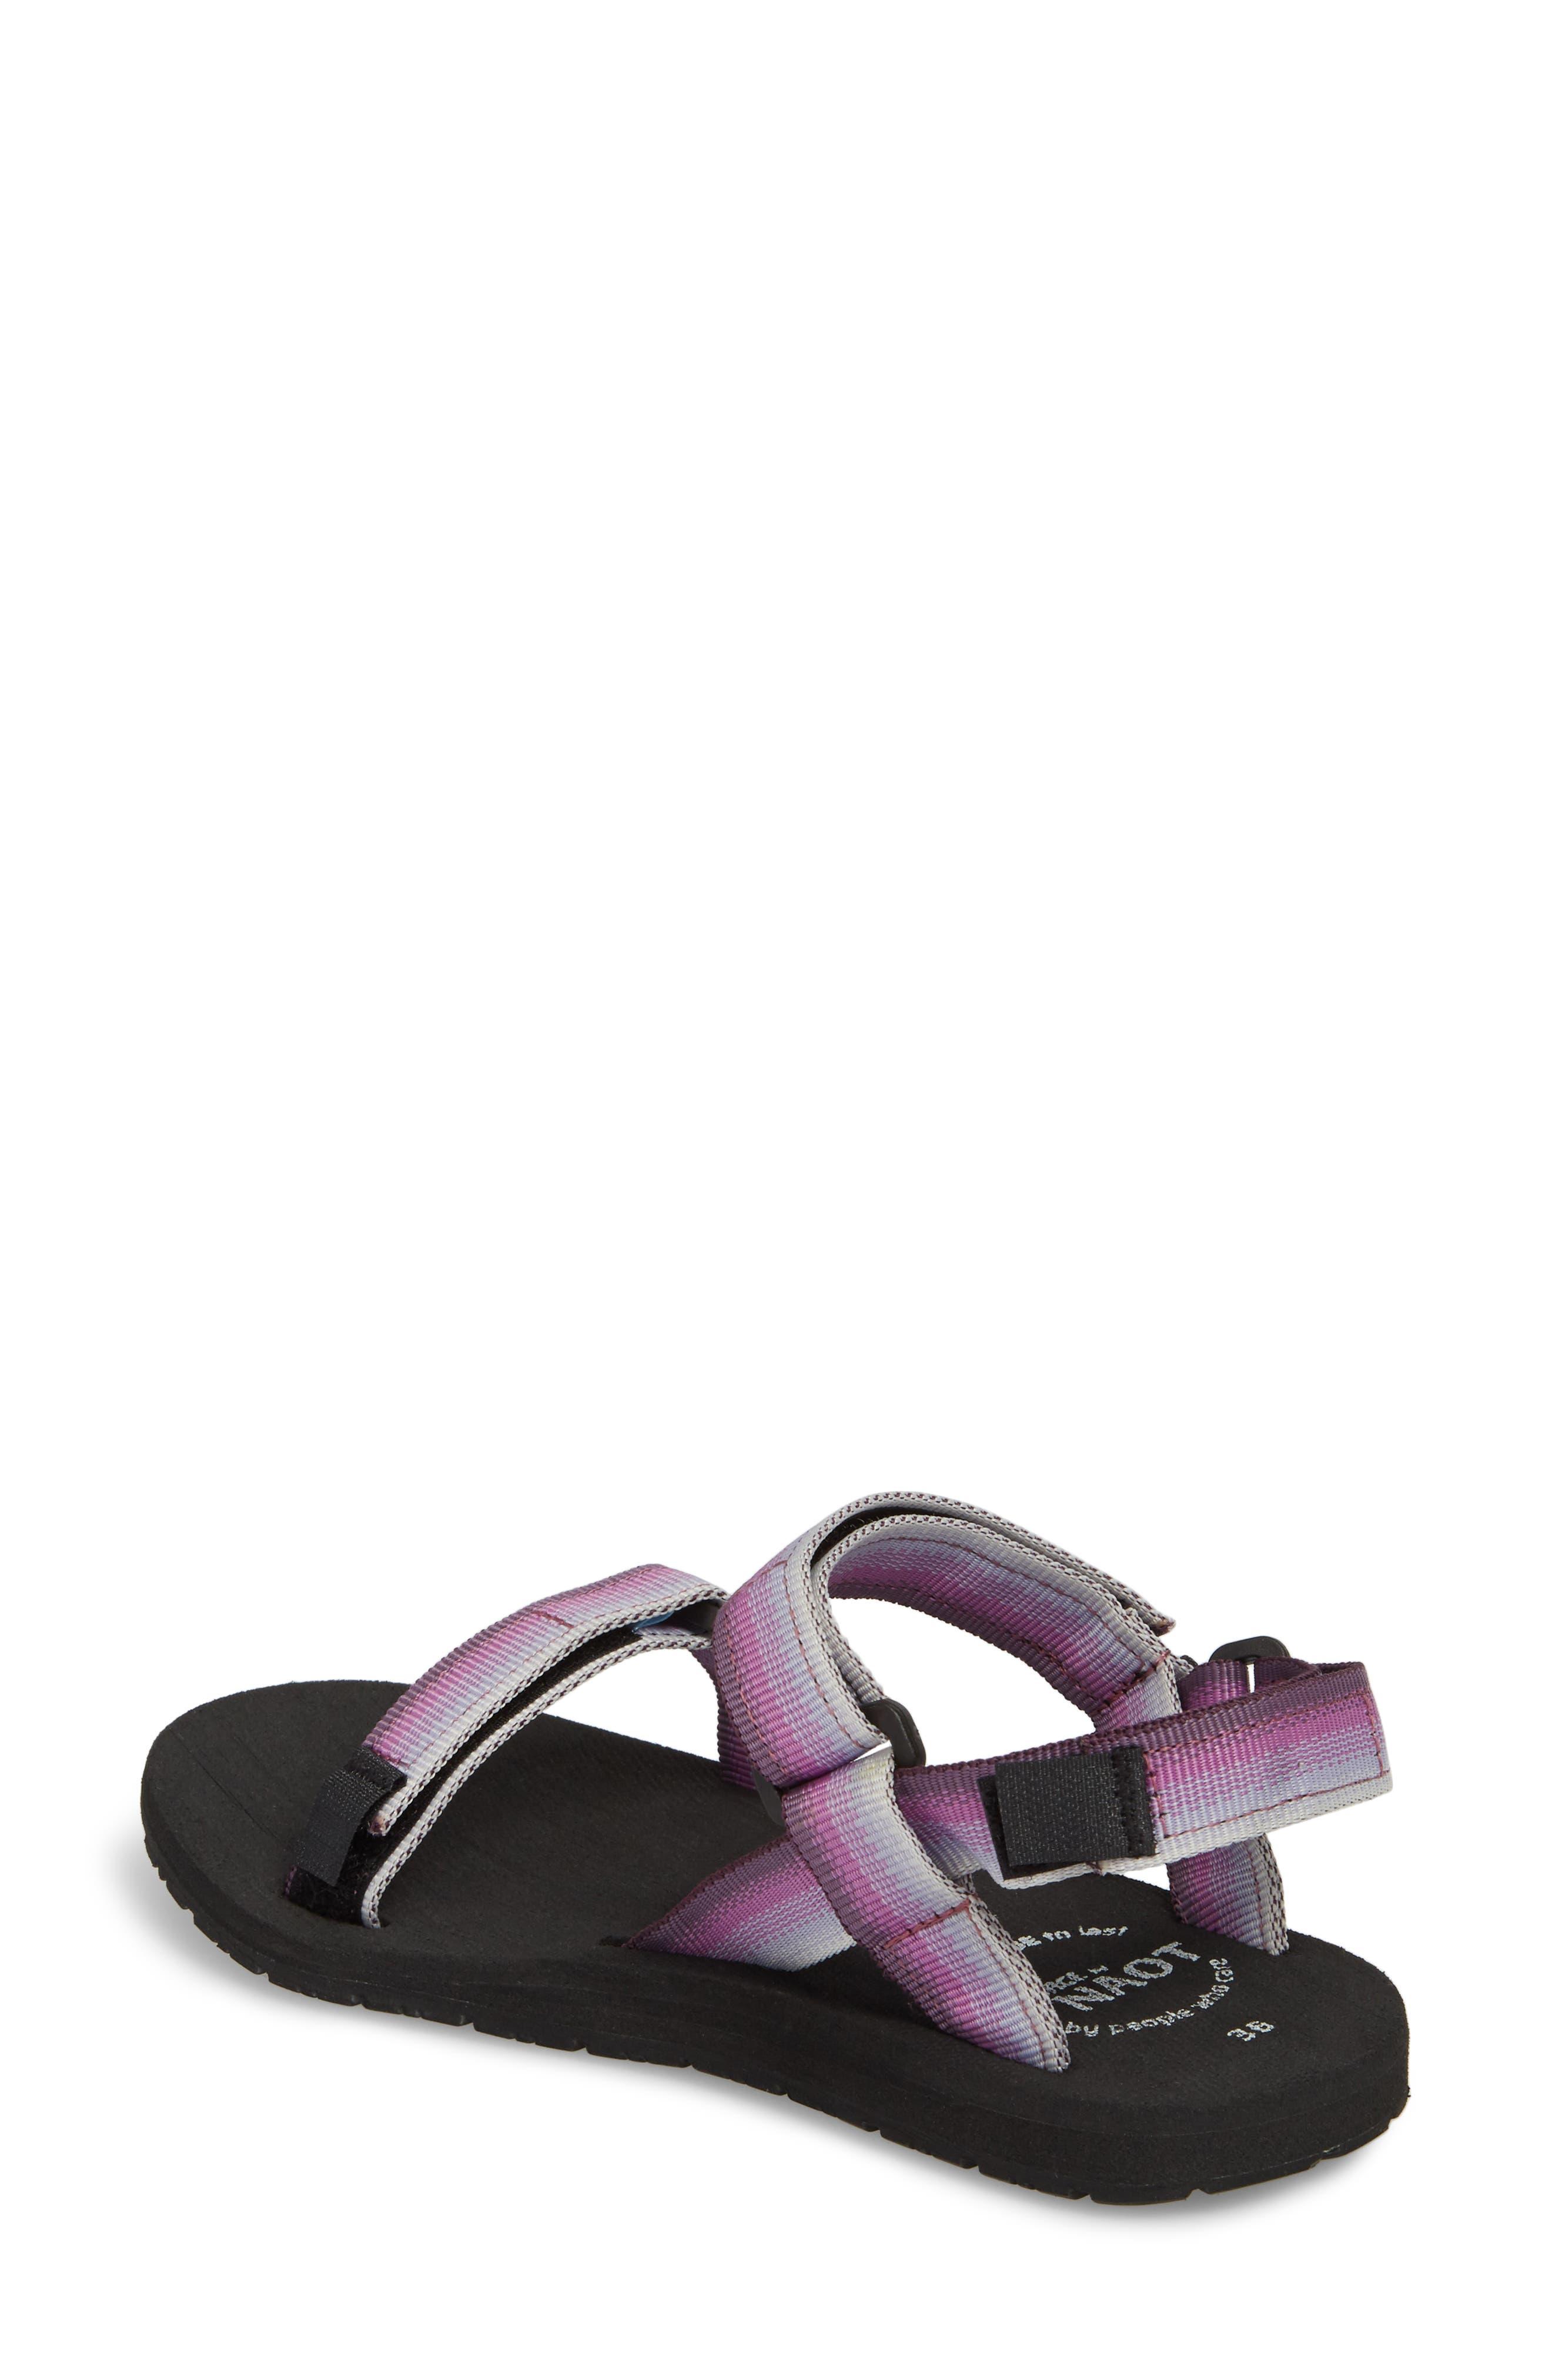 Haven Waterproof Sandal,                             Alternate thumbnail 2, color,                             Purple Sunset Fabric